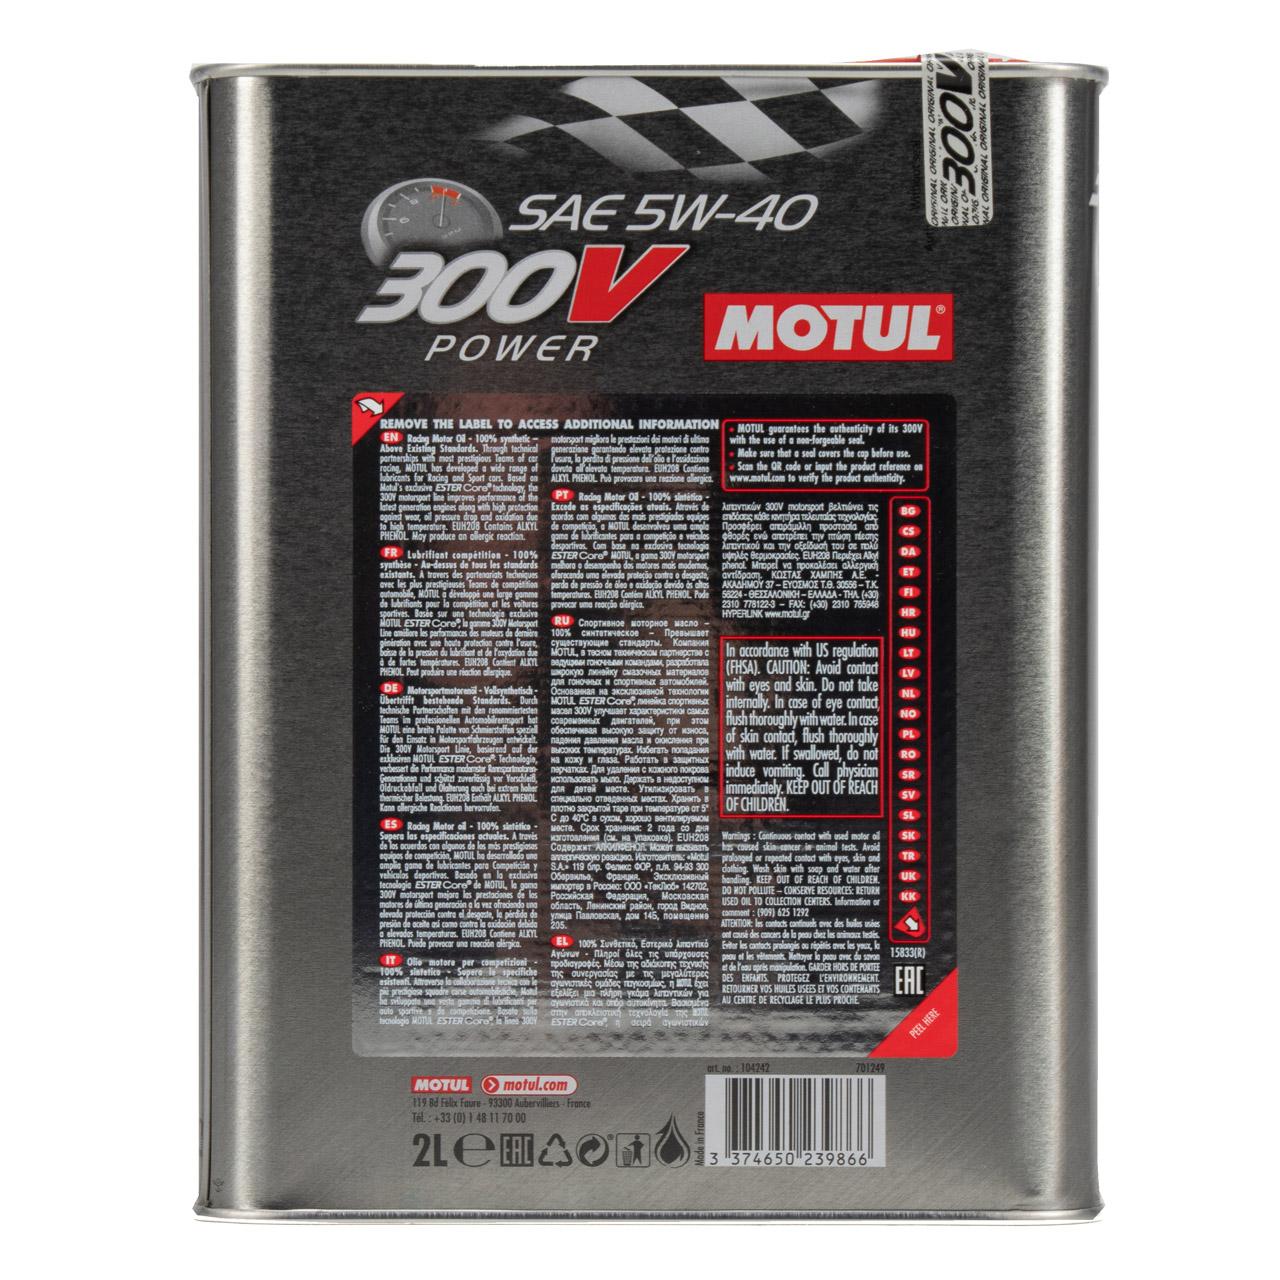 MOTUL 300V POWER RACING Motoröl Öl 5W40 100% Synthetic Ester Core - 2L 2 Liter